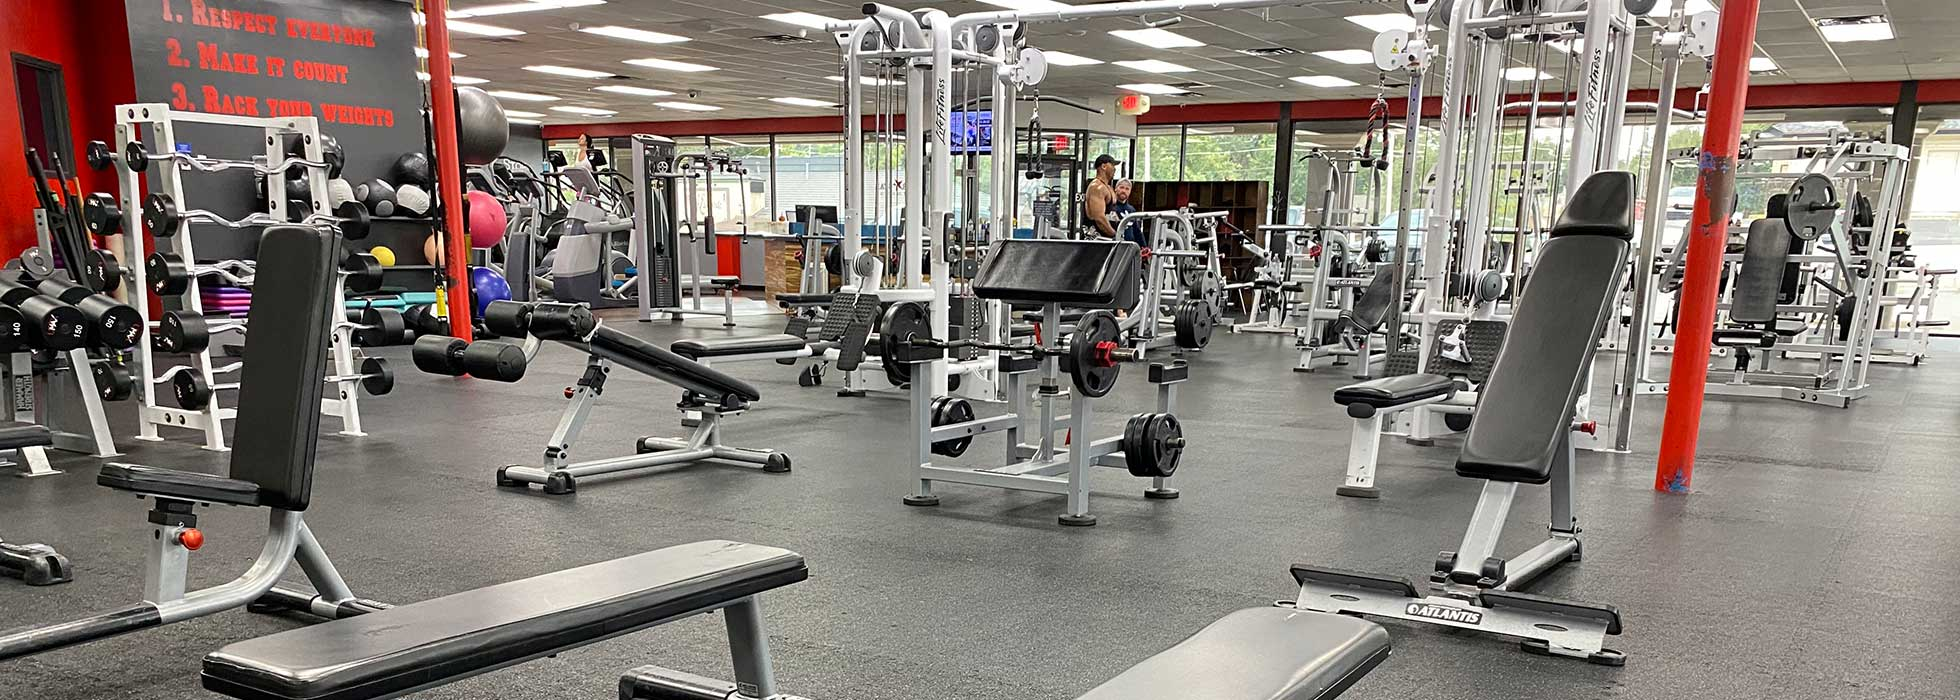 24/7 Fitness Gym near Mustang OK, 24/7 Fitness Gym near Edmond OK, 24/7 Fitness Gym on N. May near Oklahoma City OK, 24/7 Fitness Gym near Downtown Oklahoma City OK, 24/7 Fitness Gym near Yukon OK